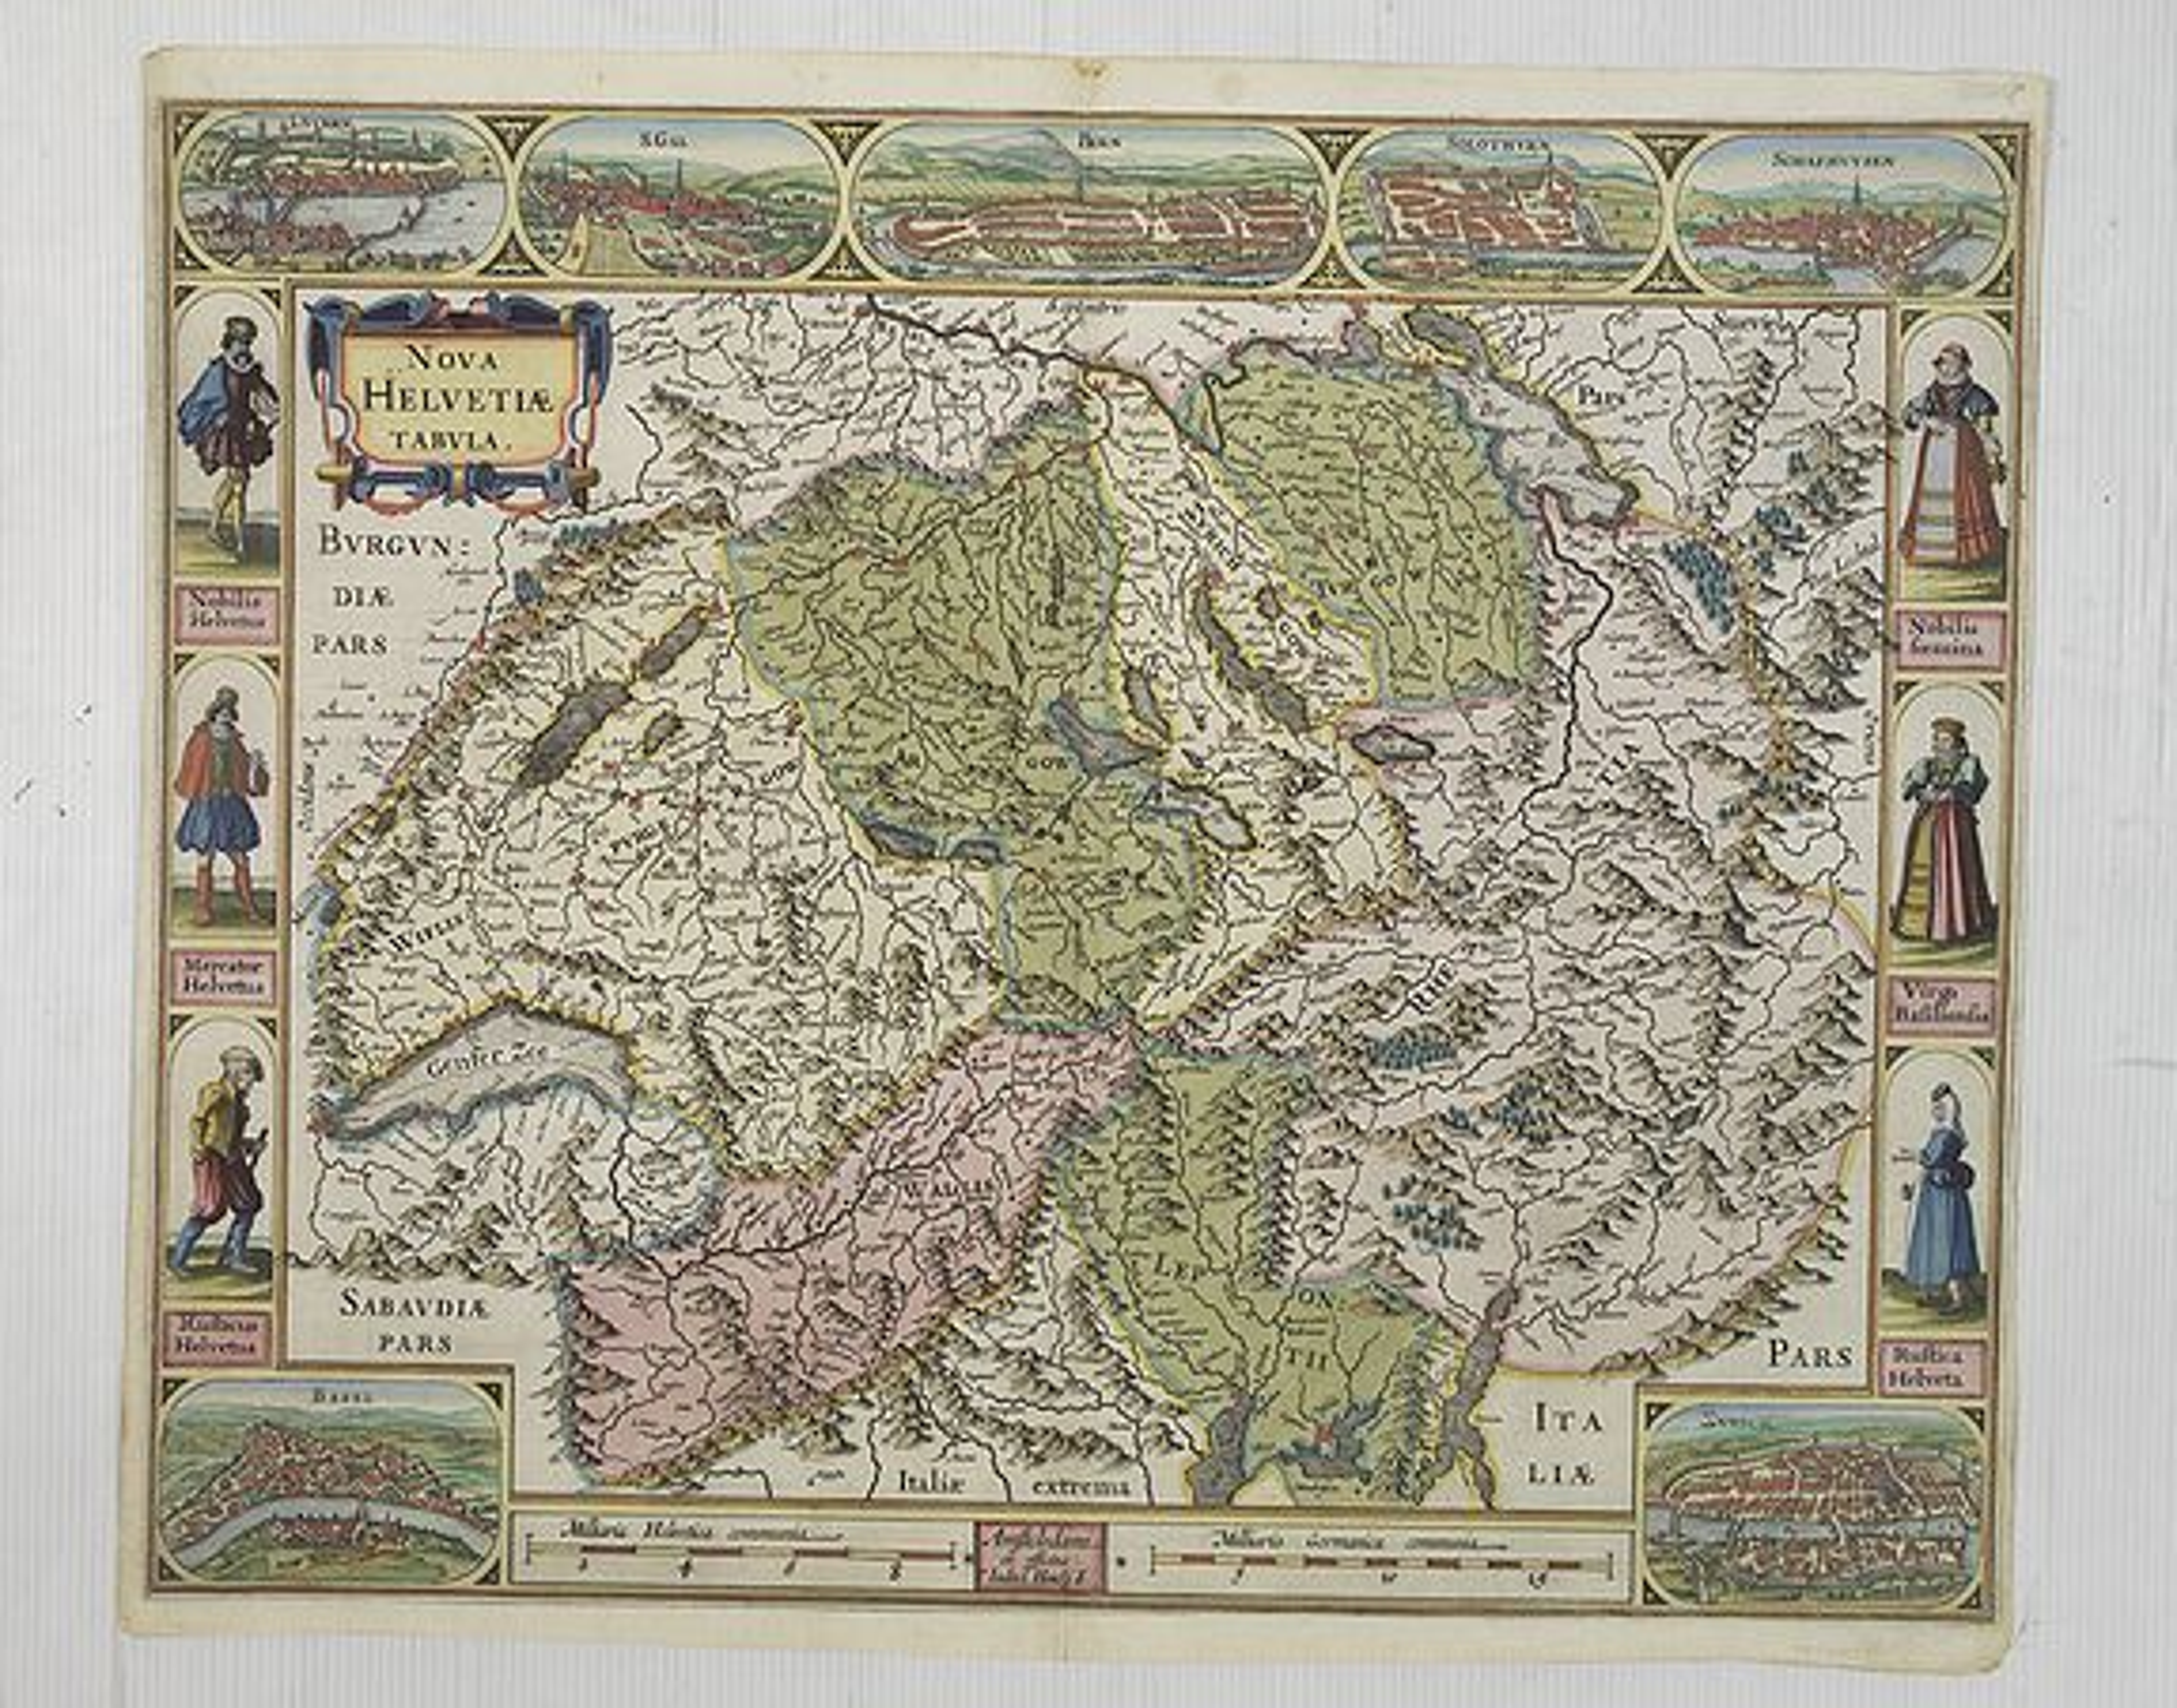 JANSSON, J. -  Nova Helvetiae Tabula.